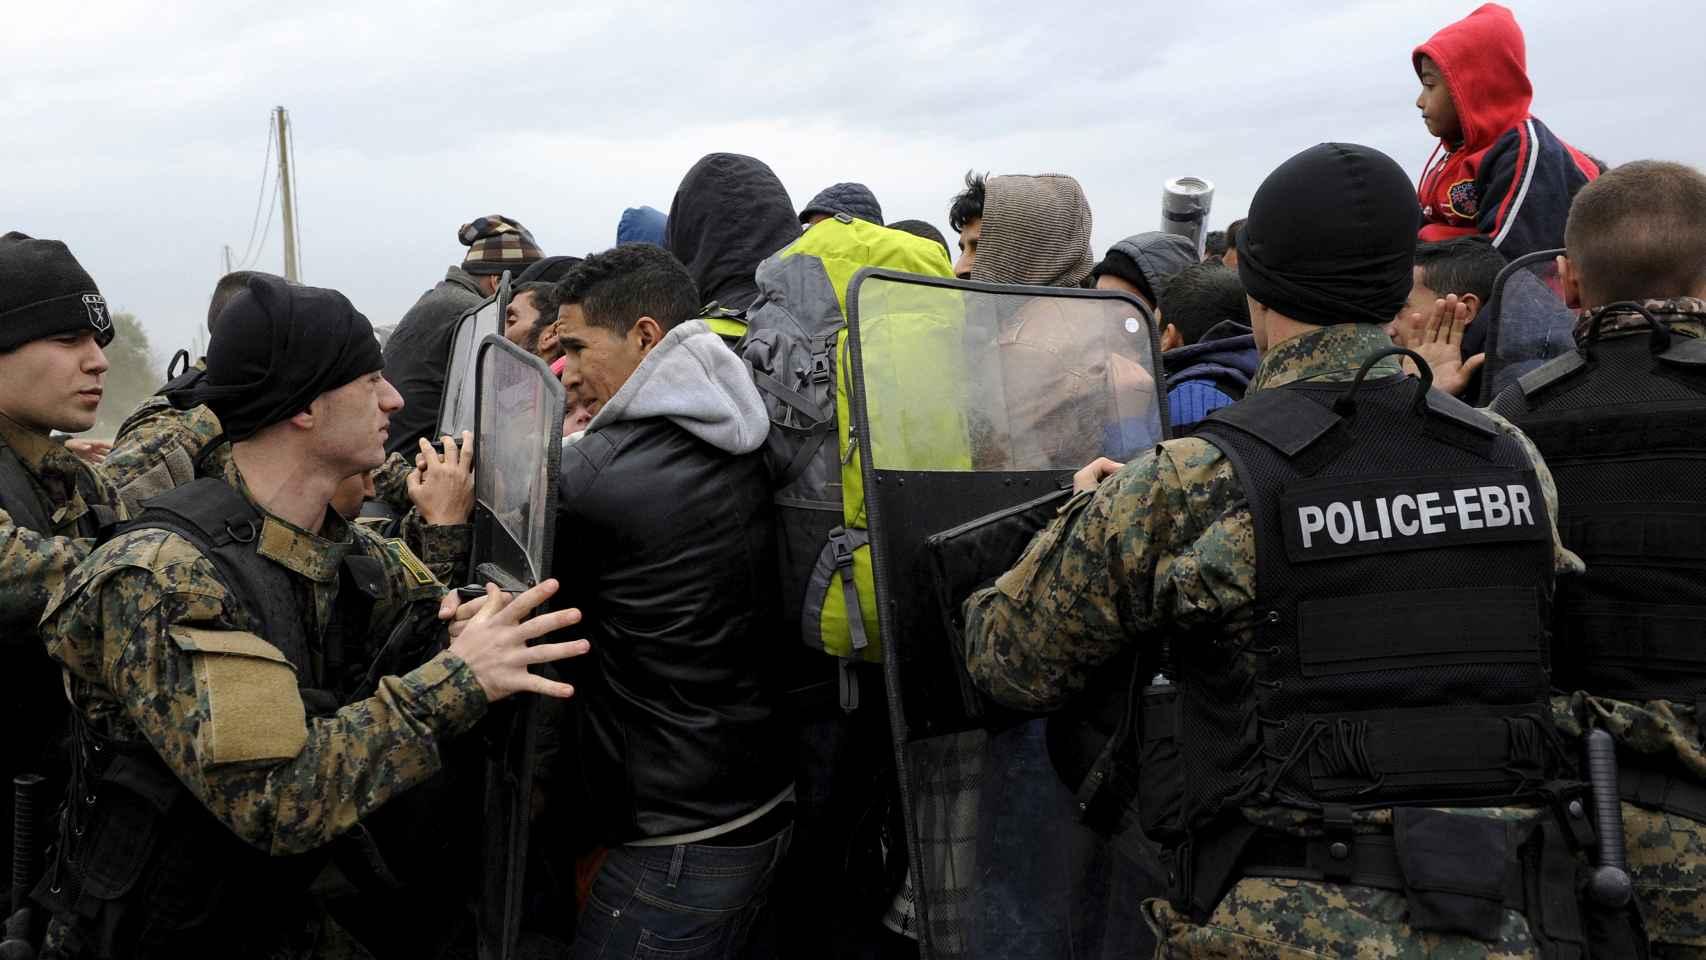 Numerosos refugiados llegan a la UE a través de la isla griega de Lesbos.